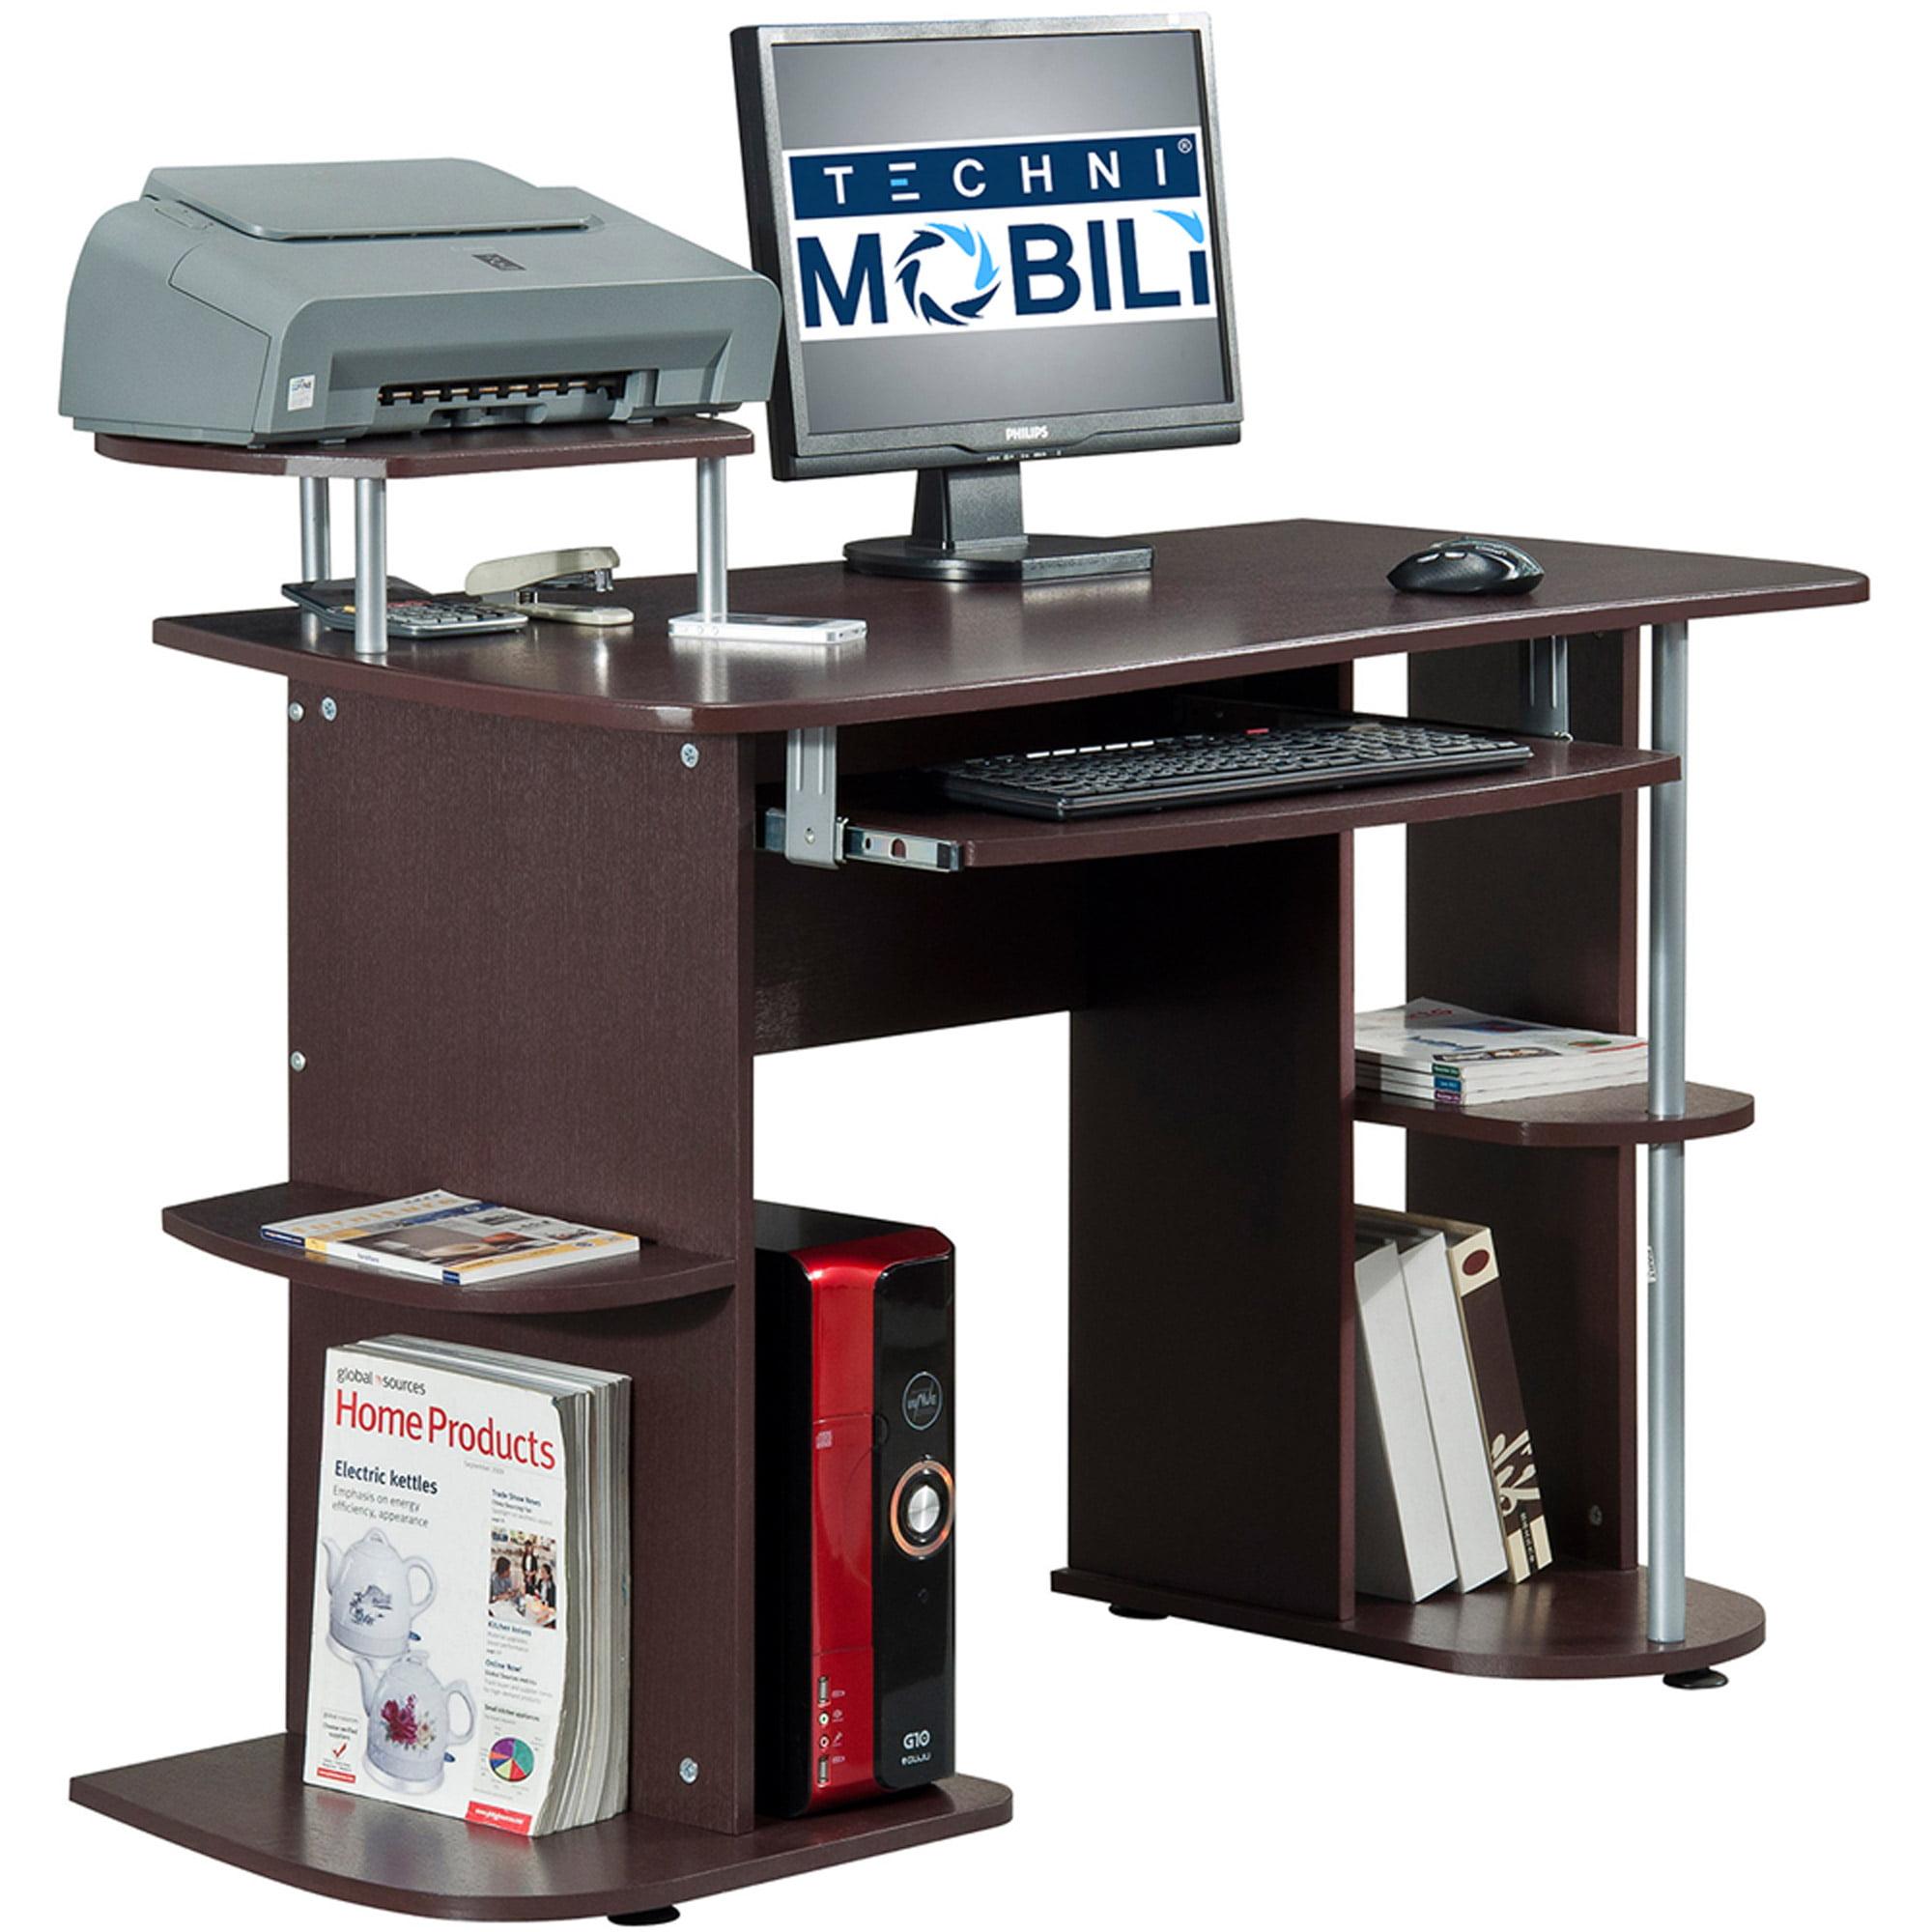 Techni Mobili Multifunction Computer Desk, Chocolate